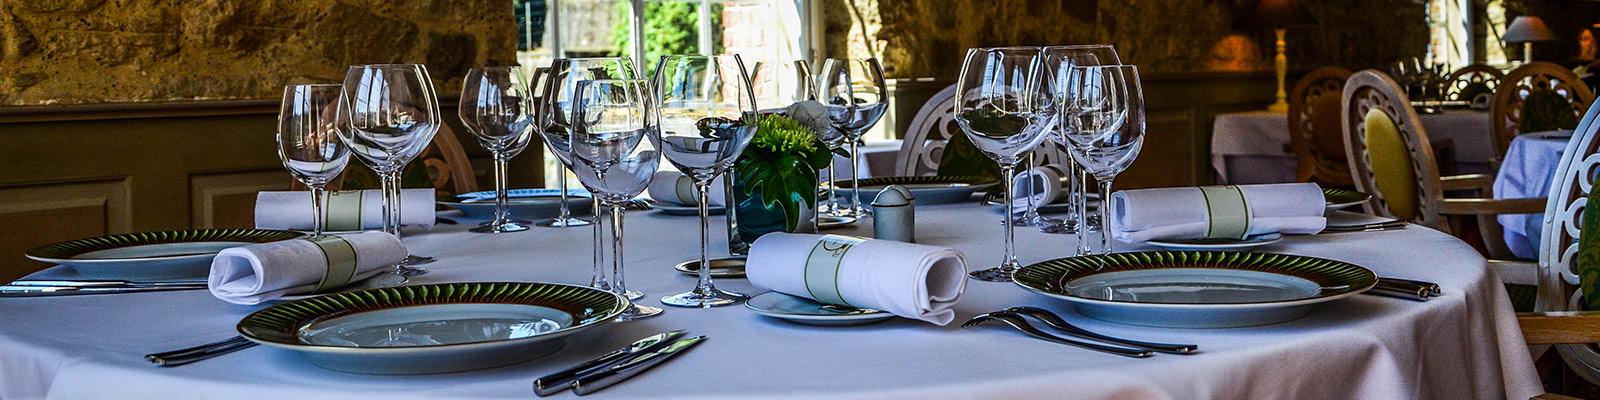 dressage-table-restaurant2-lesud